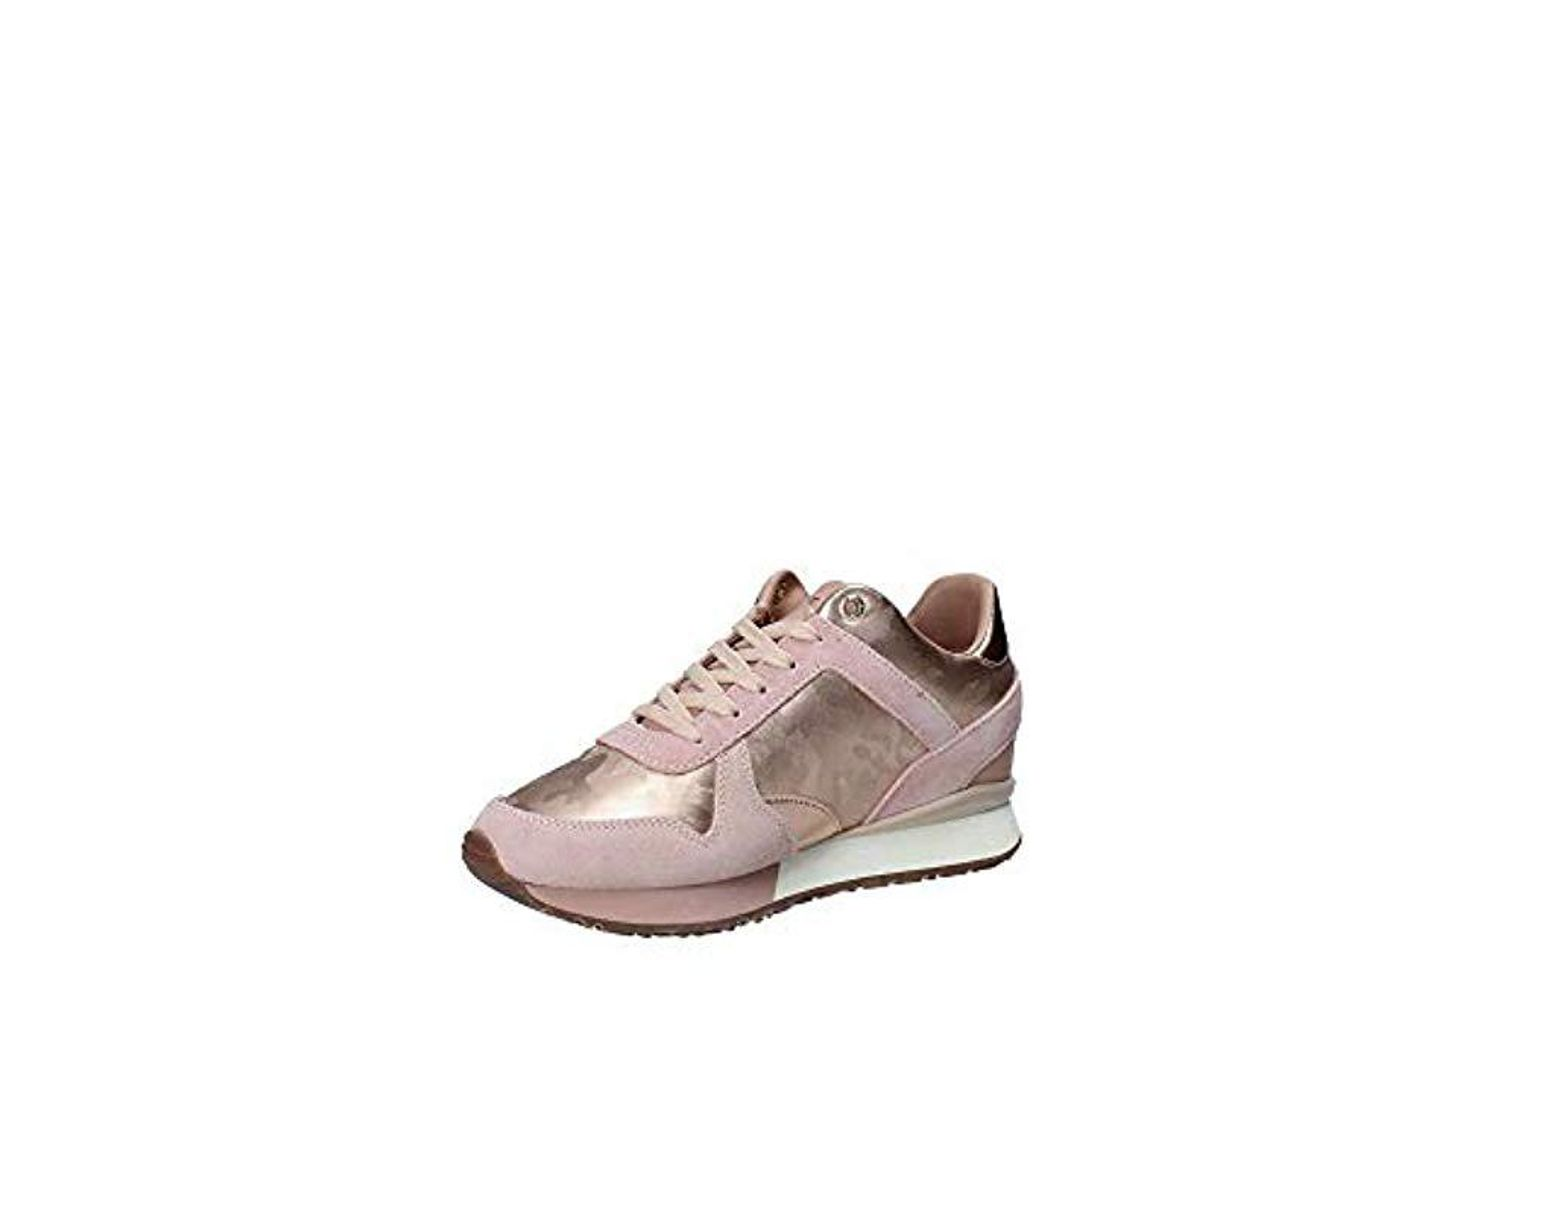 09fdb752516a0 Tommy Hilfiger Camo Metallic Wedge Sneaker Low-top in Metallic - Lyst